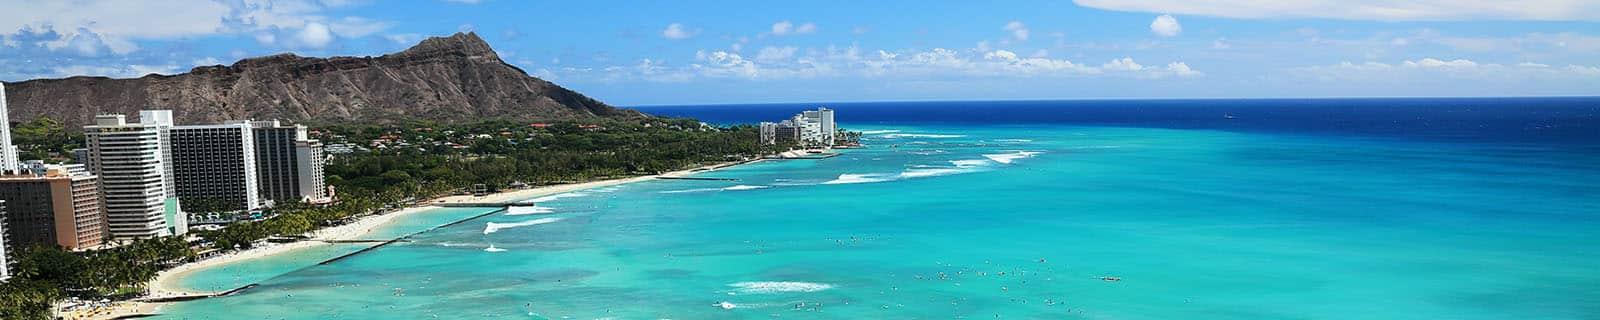 Tours de crucero por Hawái